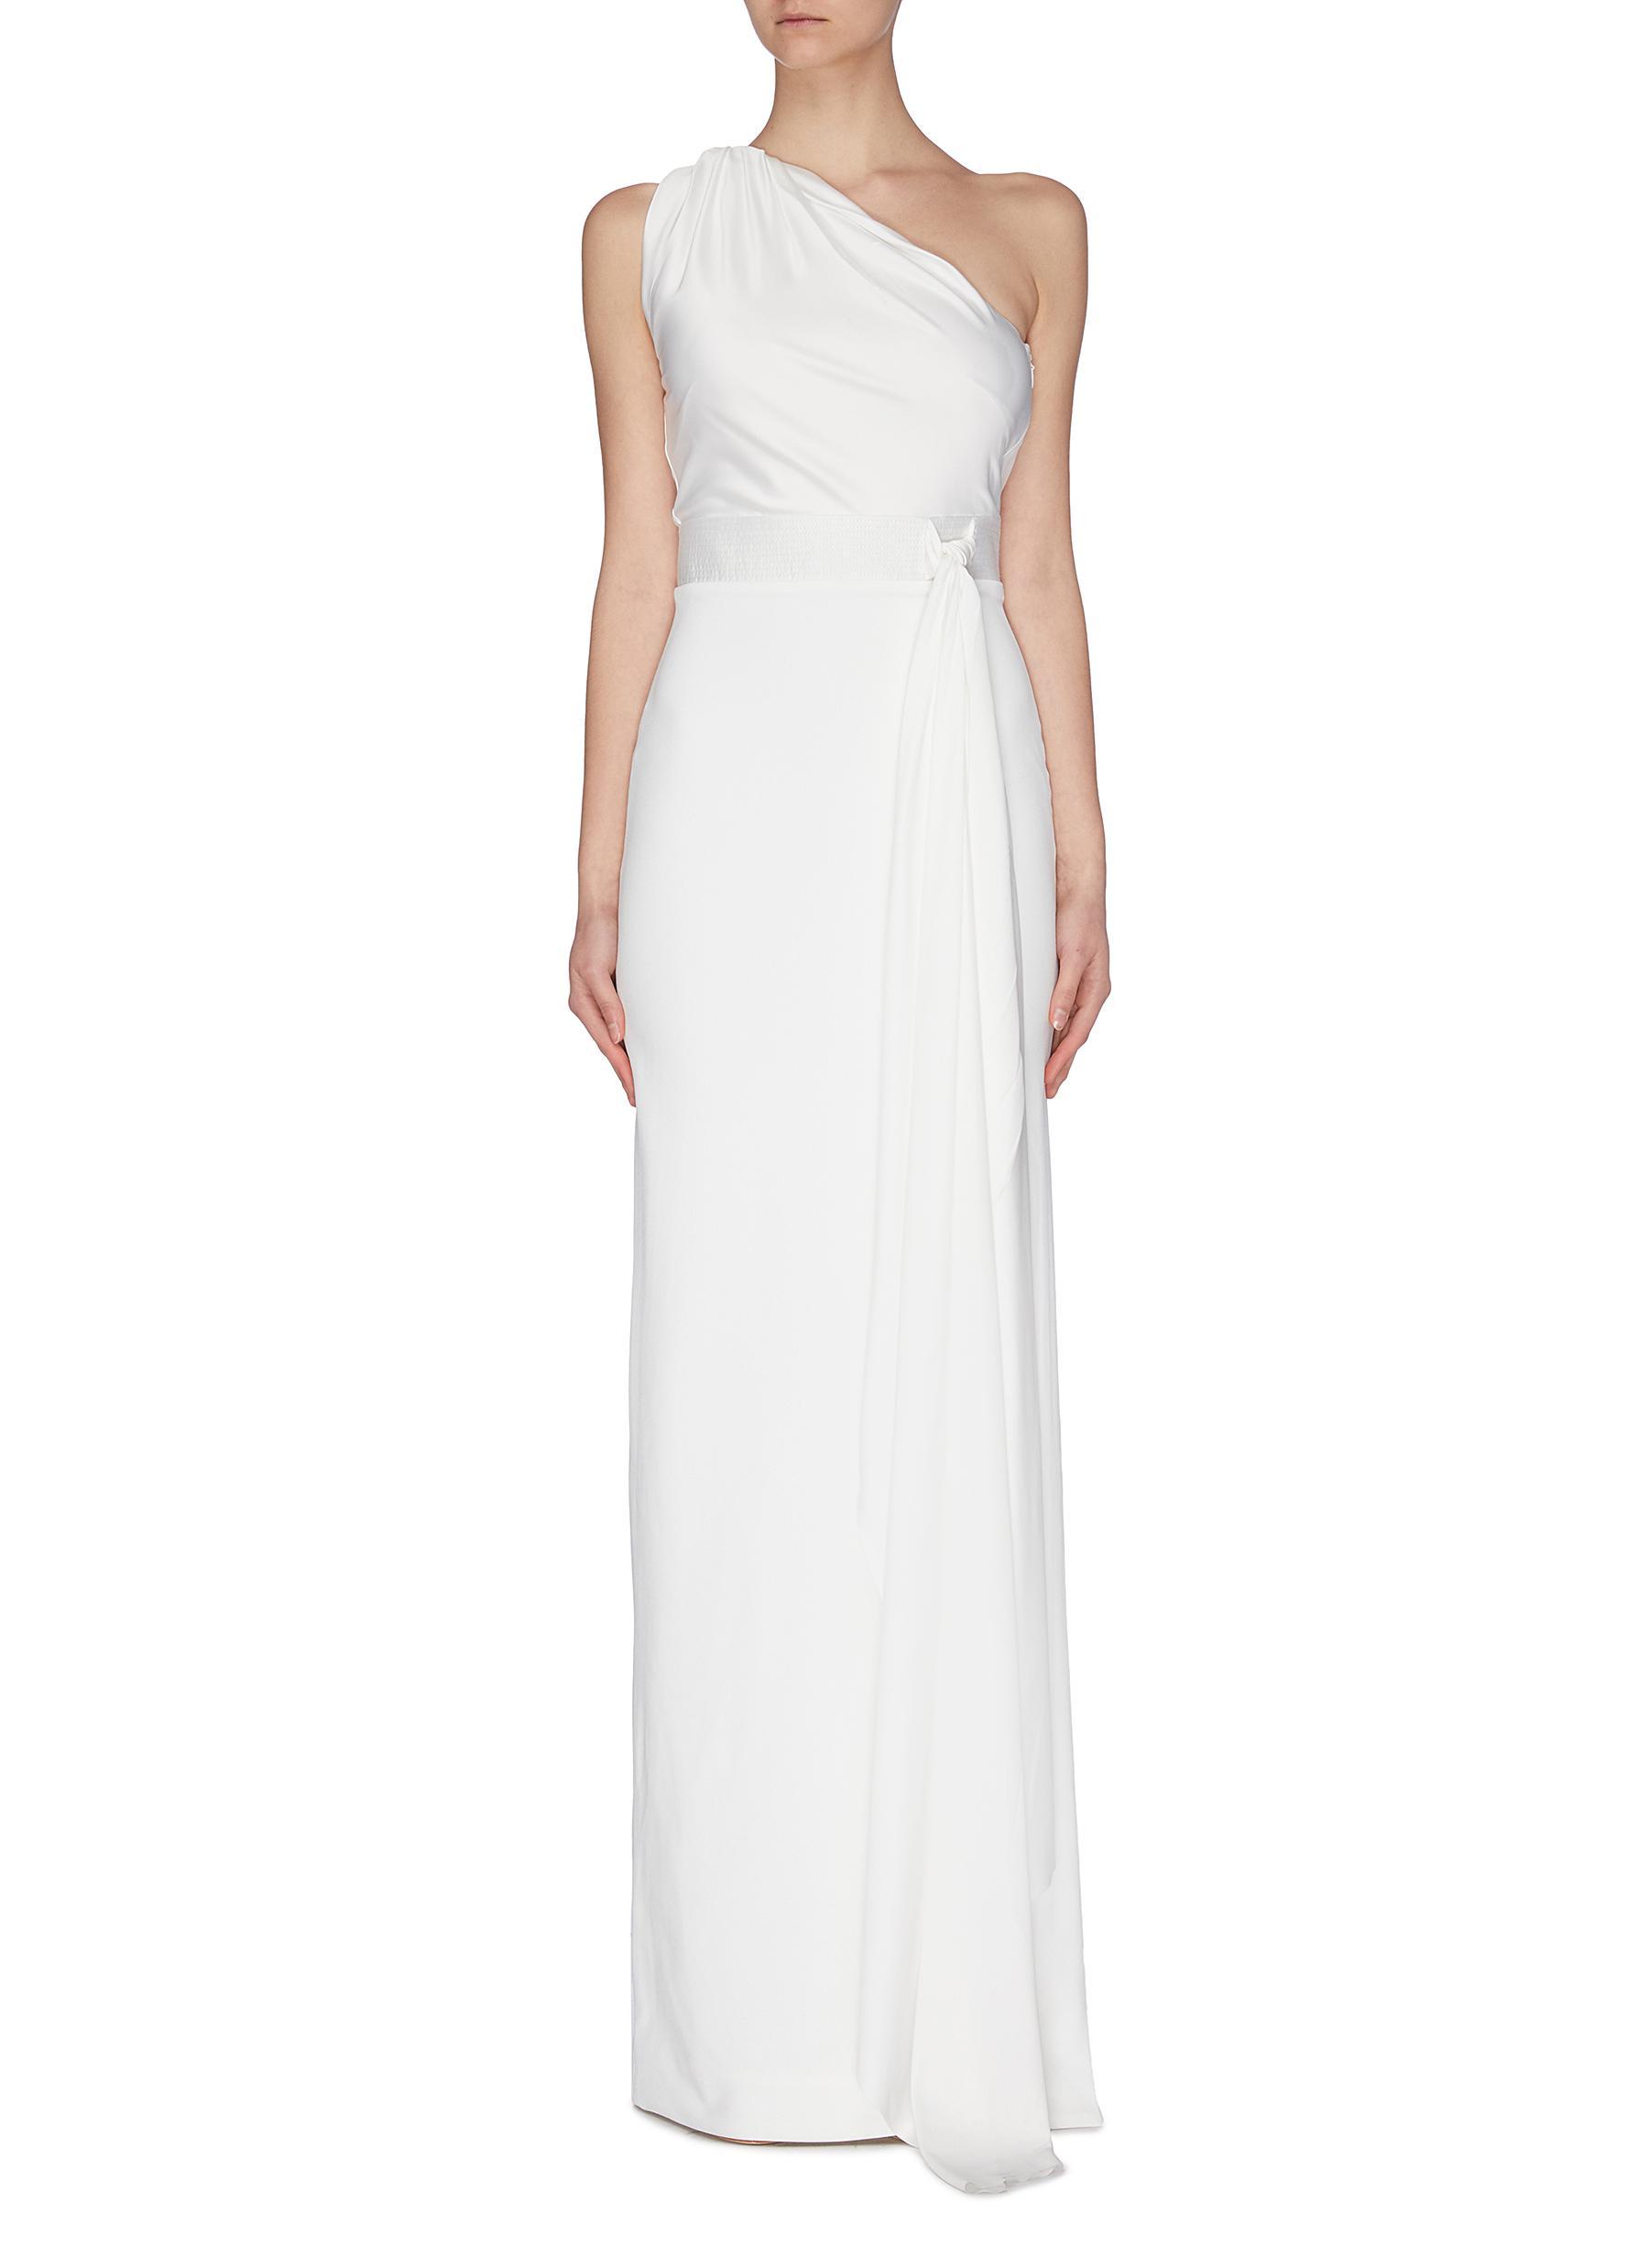 shop Solace London 'Mara' one shoulder waist detail maxi dress online